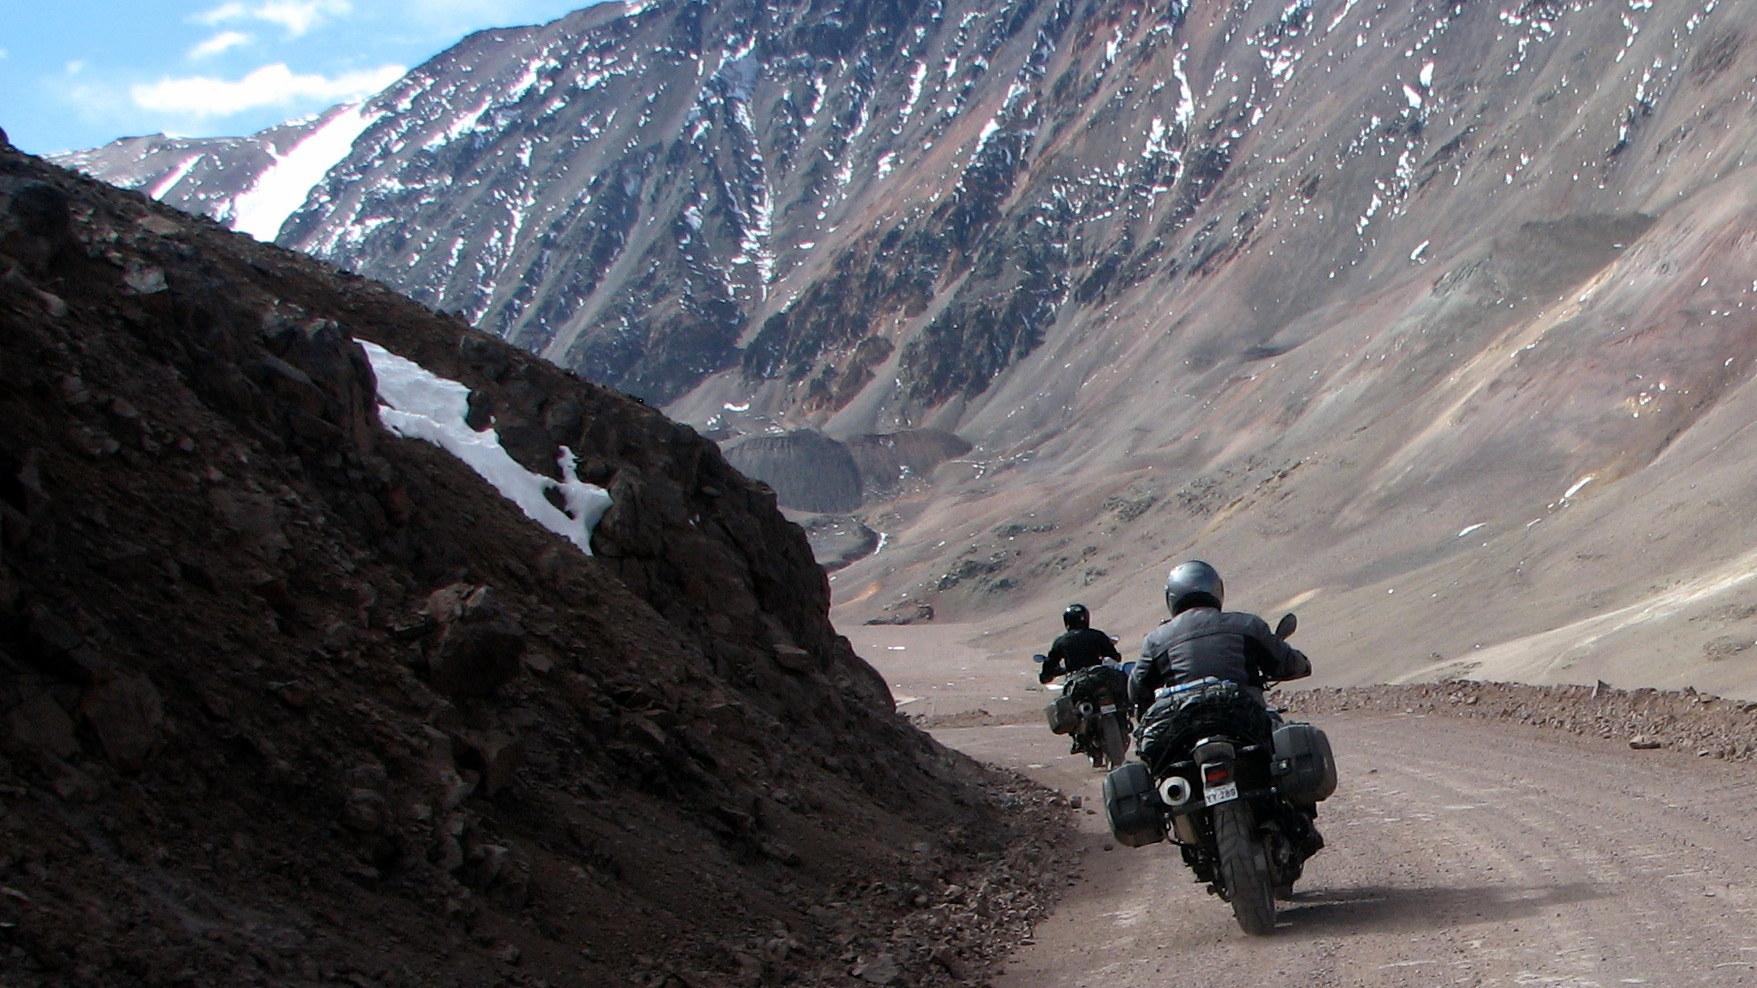 Climbing on a motorbike